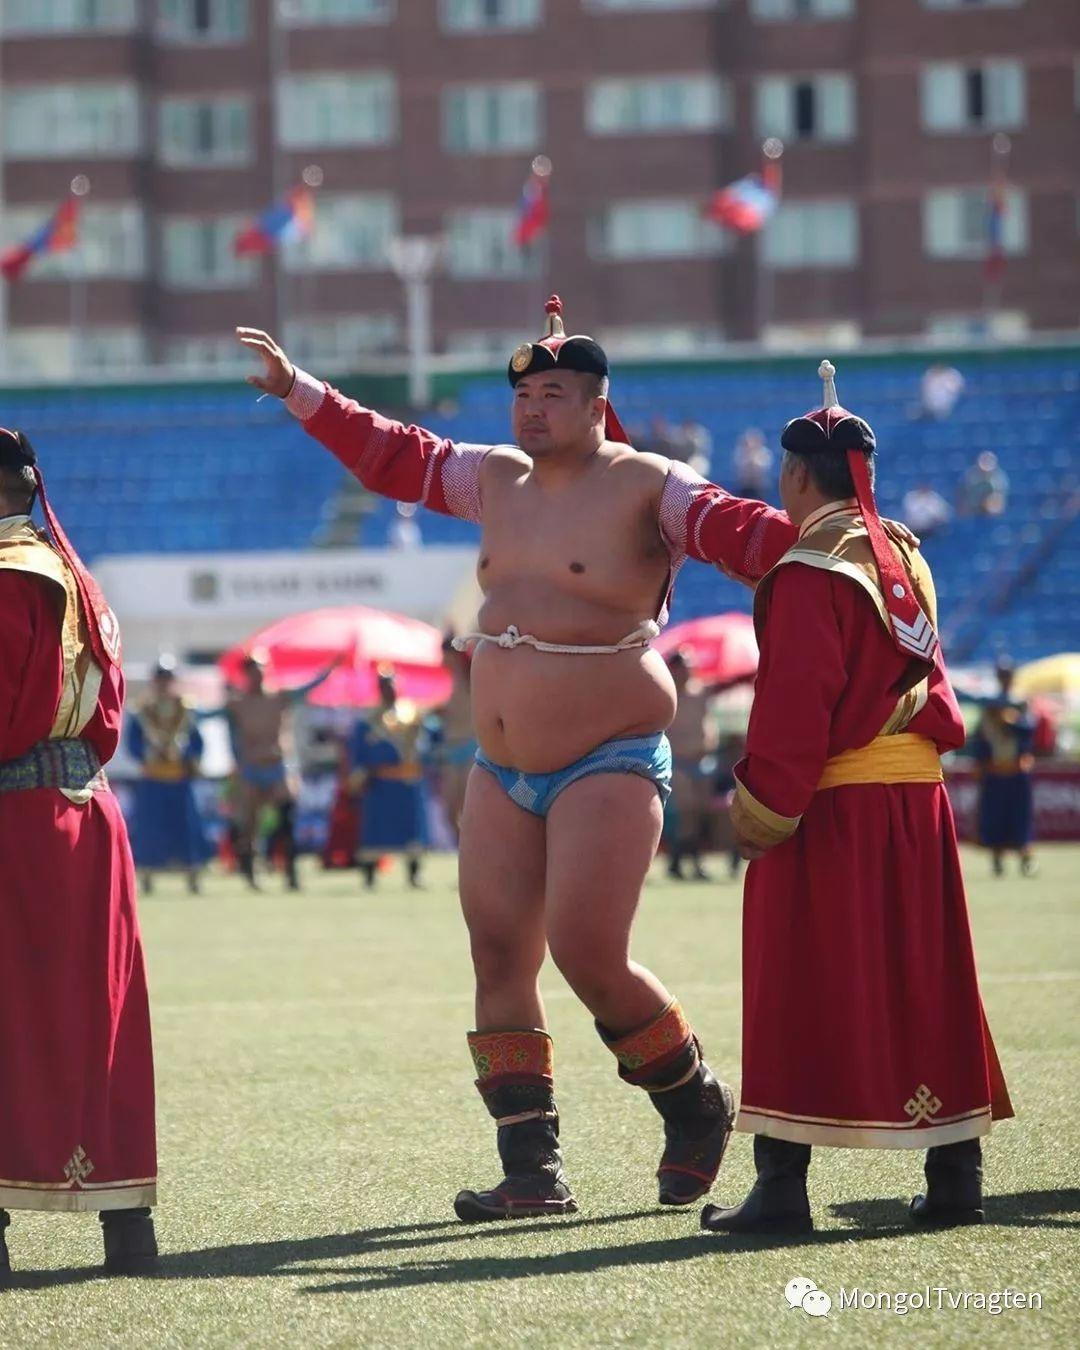 ᠮᠣᠩᠭᠣᠯ ᠨᠠᠭᠠᠳᠣᠮ 那达慕 第83张 ᠮᠣᠩᠭᠣᠯ ᠨᠠᠭᠠᠳᠣᠮ 那达慕 蒙古文化